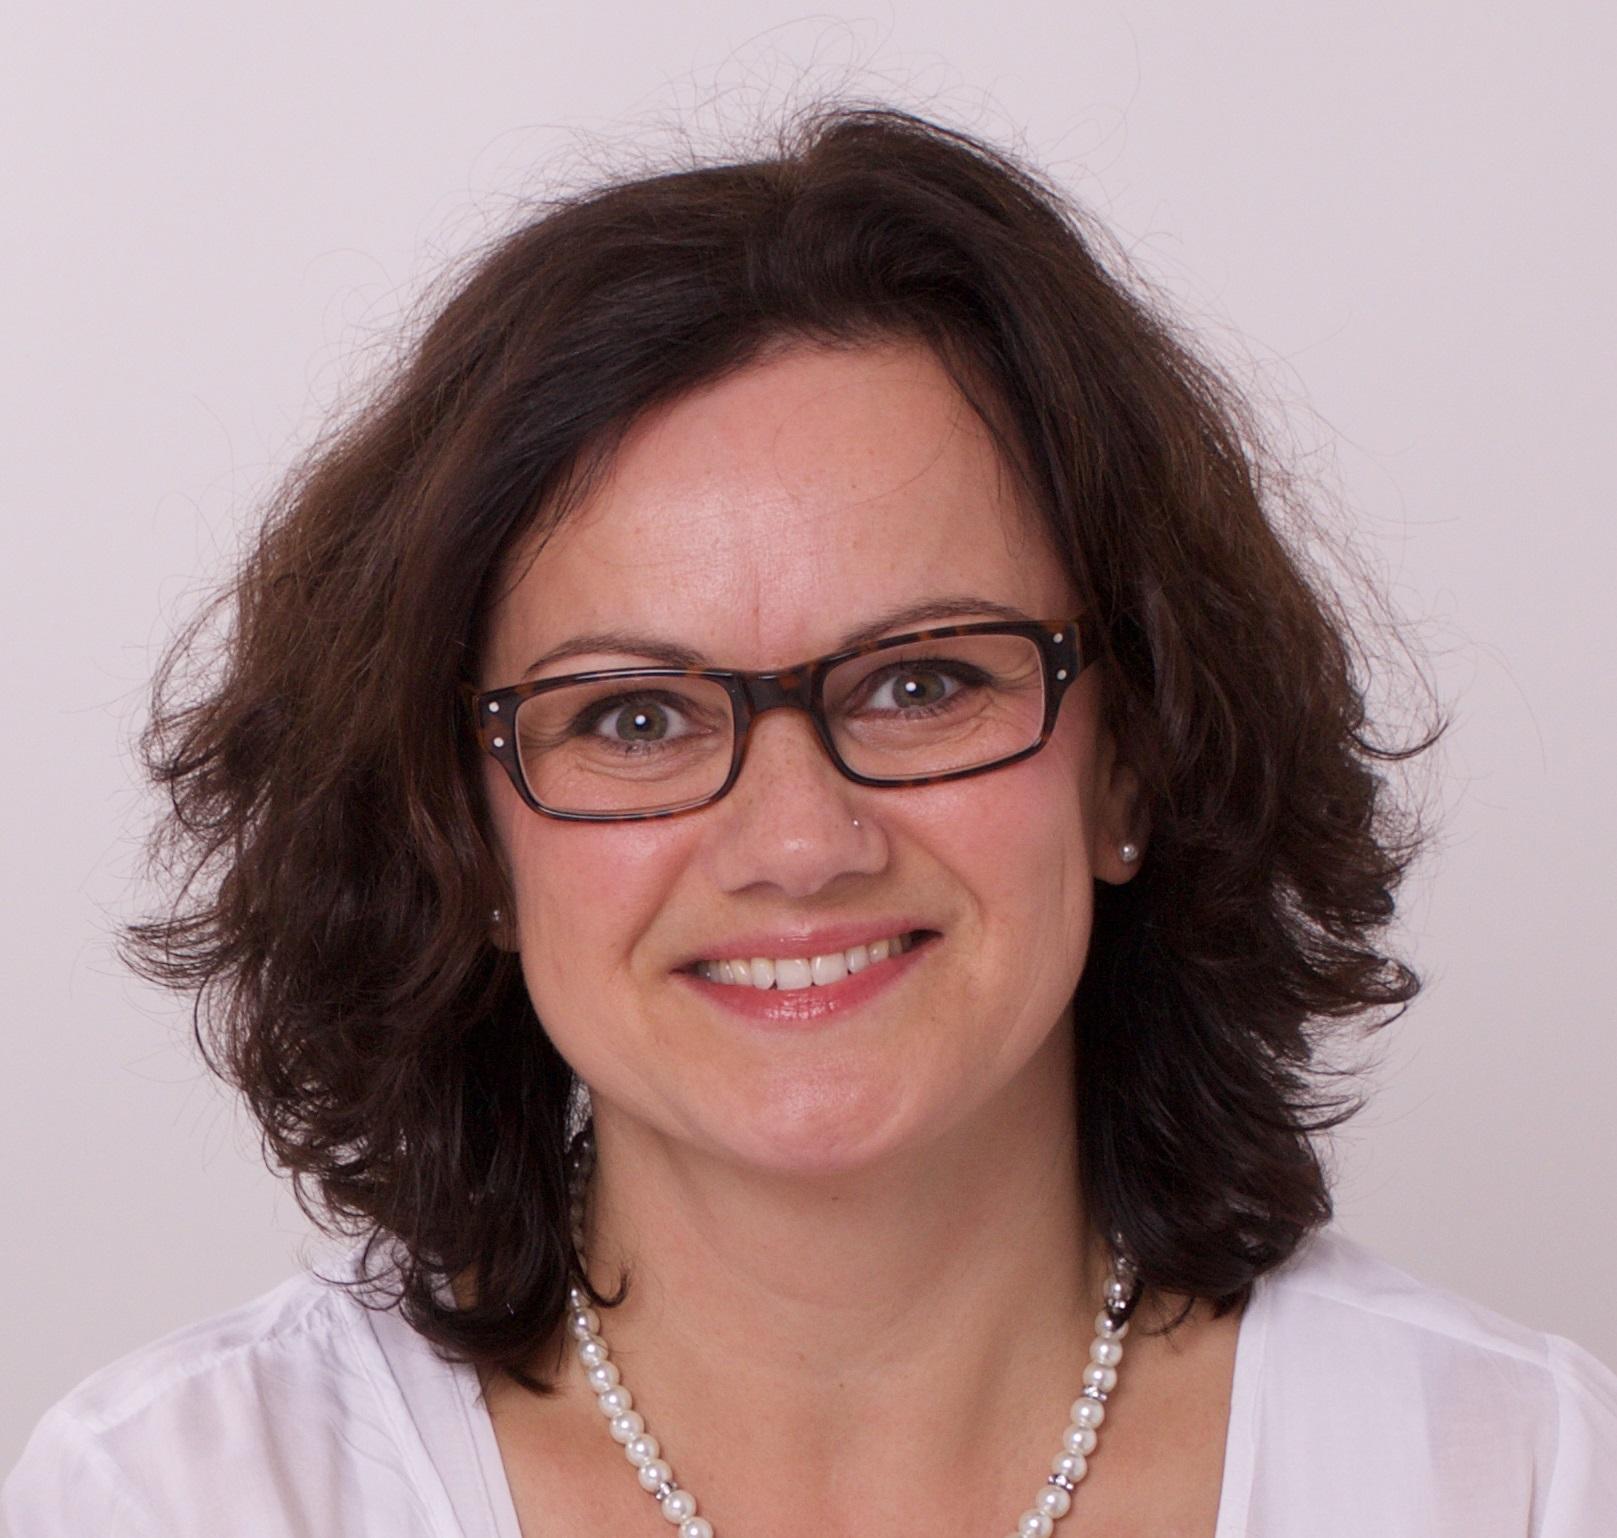 Petra Baltischwiler, Zeremonienleiterin